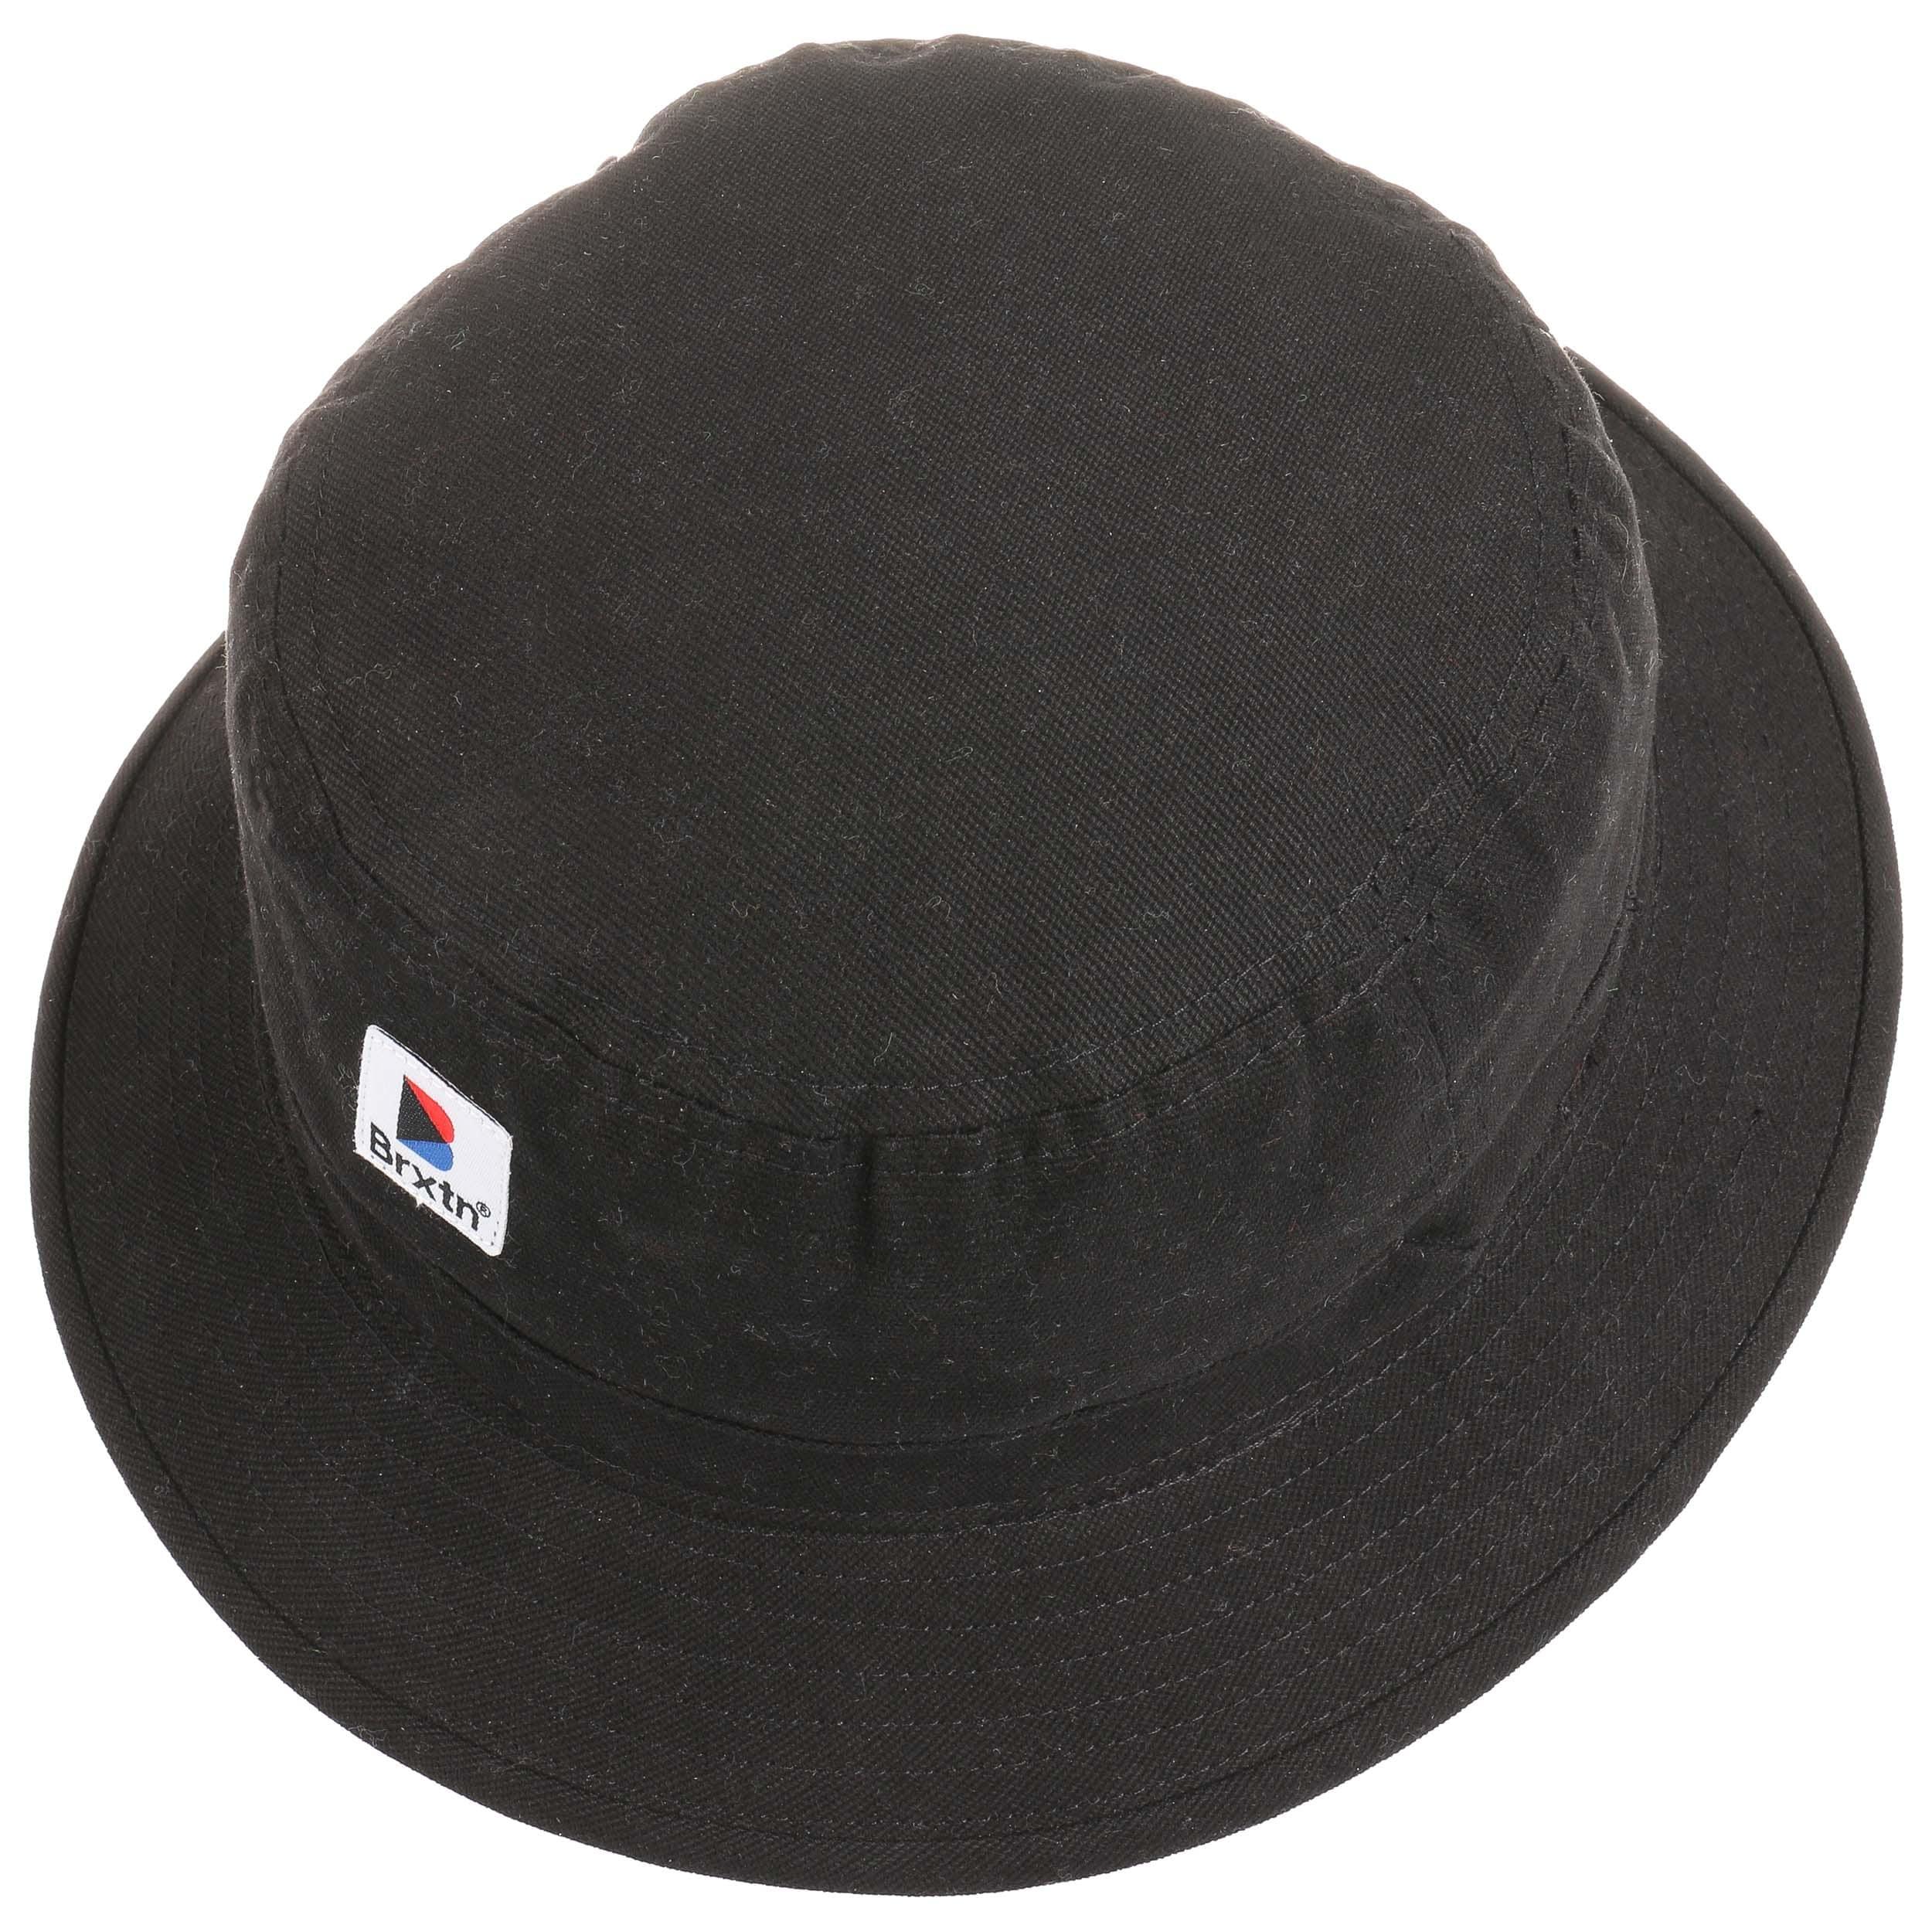 ... low price stowell bucket hat by brixton black 1 e3ec0 bec03 d77edd835ef8